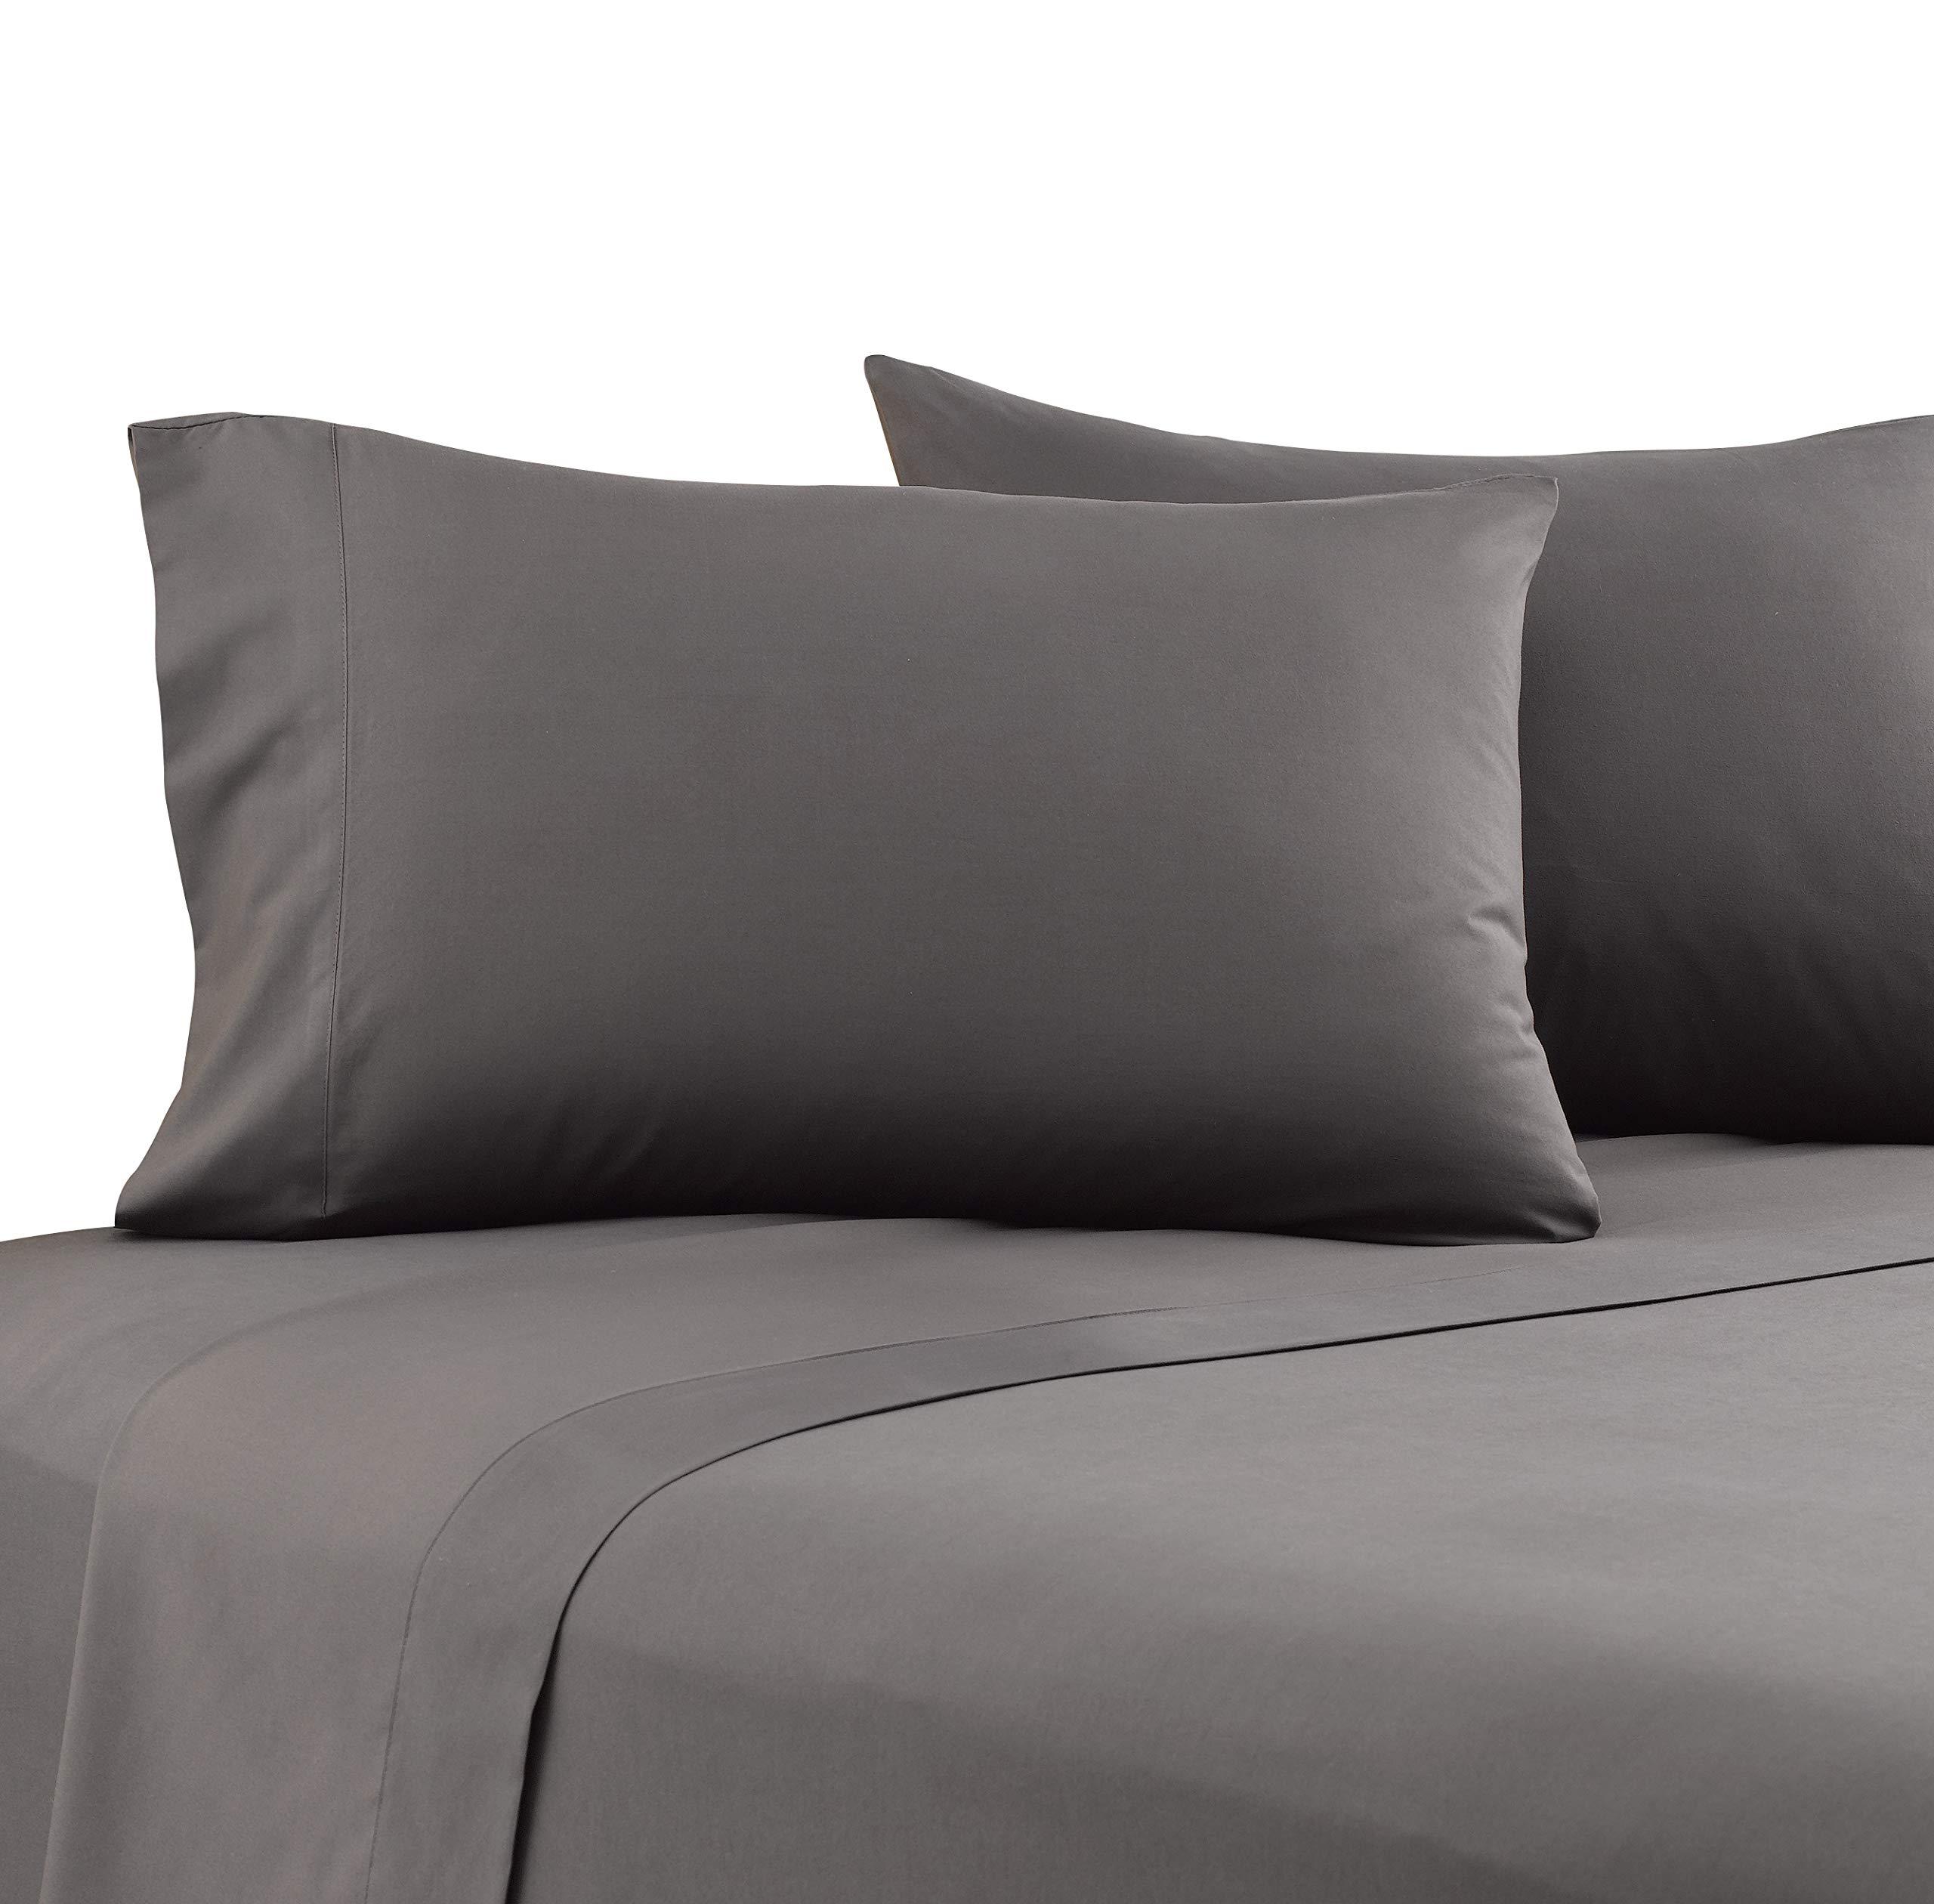 Karalai Bed Sheet Set 1800 Series King Size Sheets, Deep Pockets, Super Soft Wrinkle Free (4 Pc Dark Gray, King)